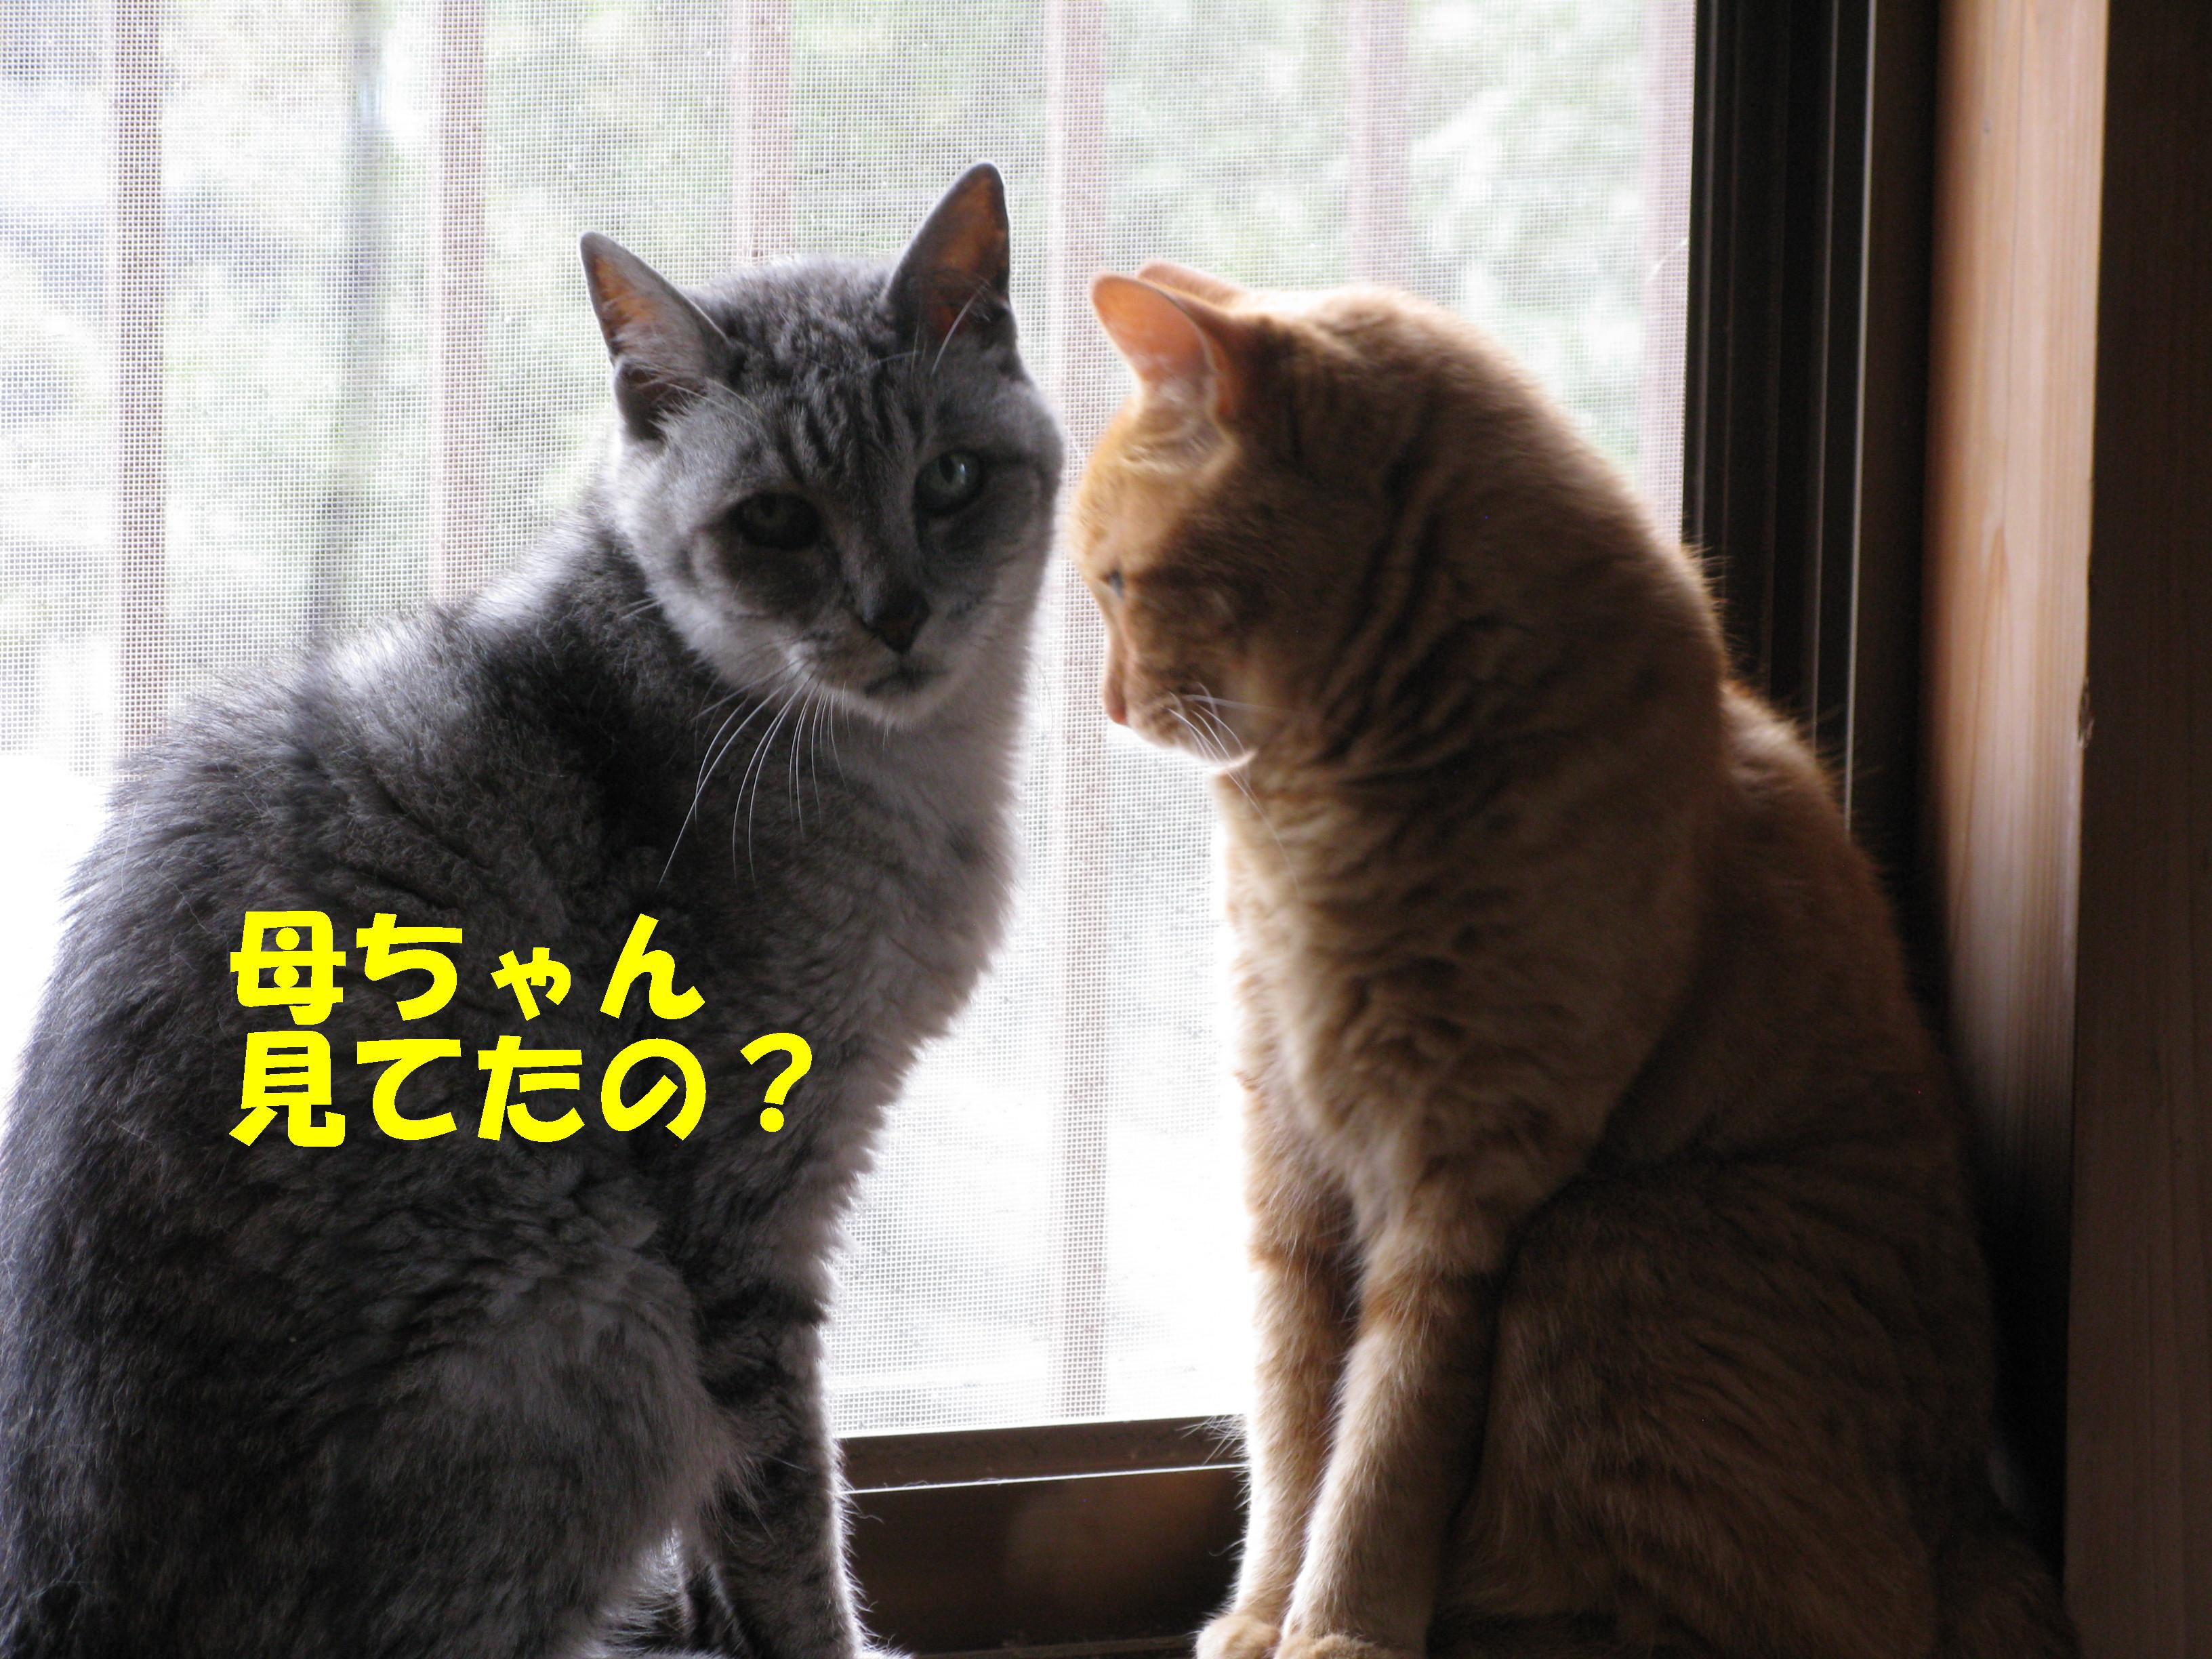 booako_201507110731.jpg